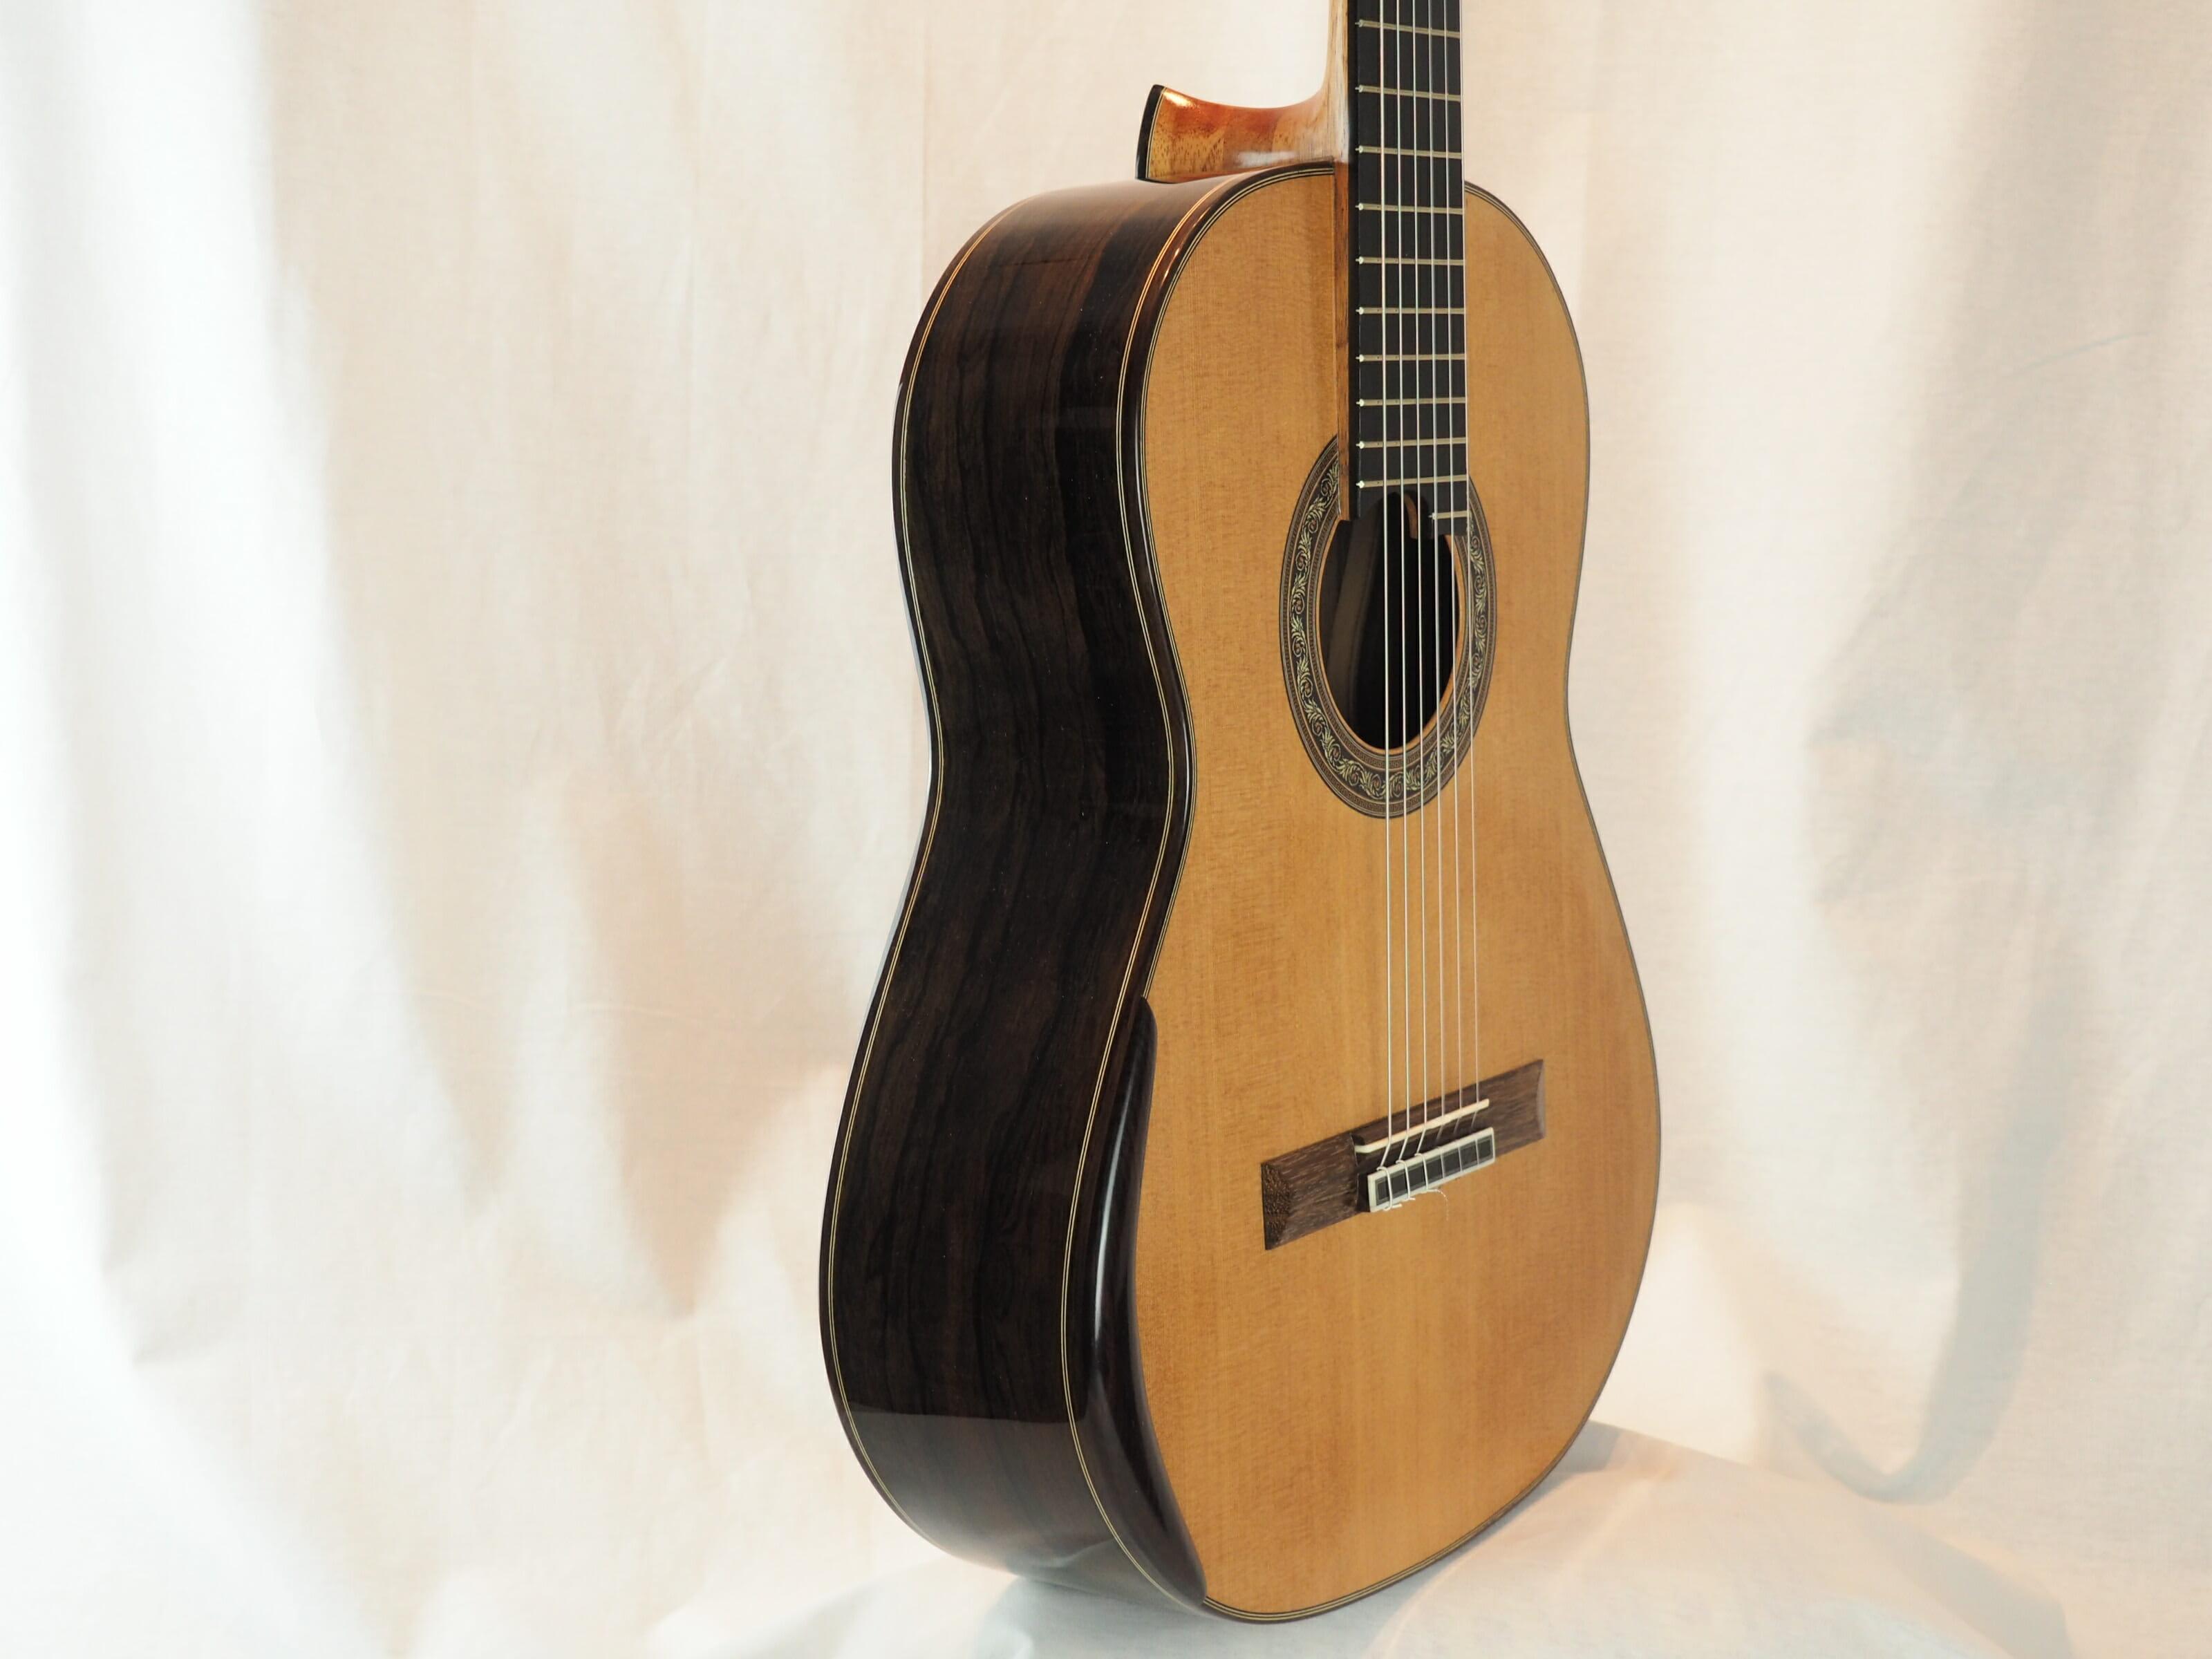 Charalampos Koumridis Luthier guitare classique N°139 19KOU139-06